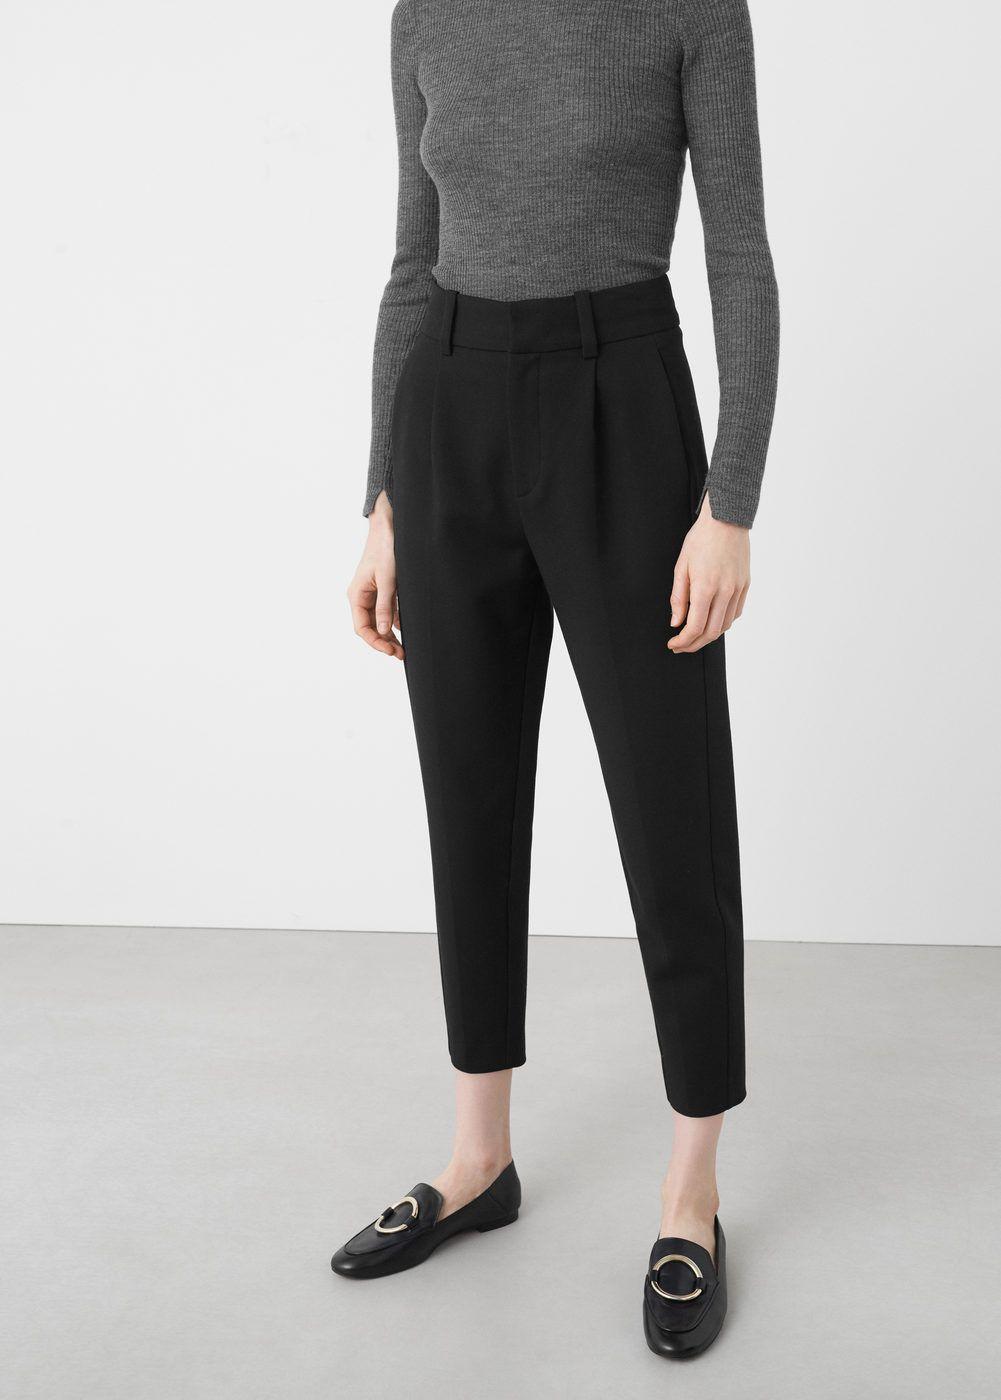 Pantalones Vestir Tiro Alto Mujer Espana